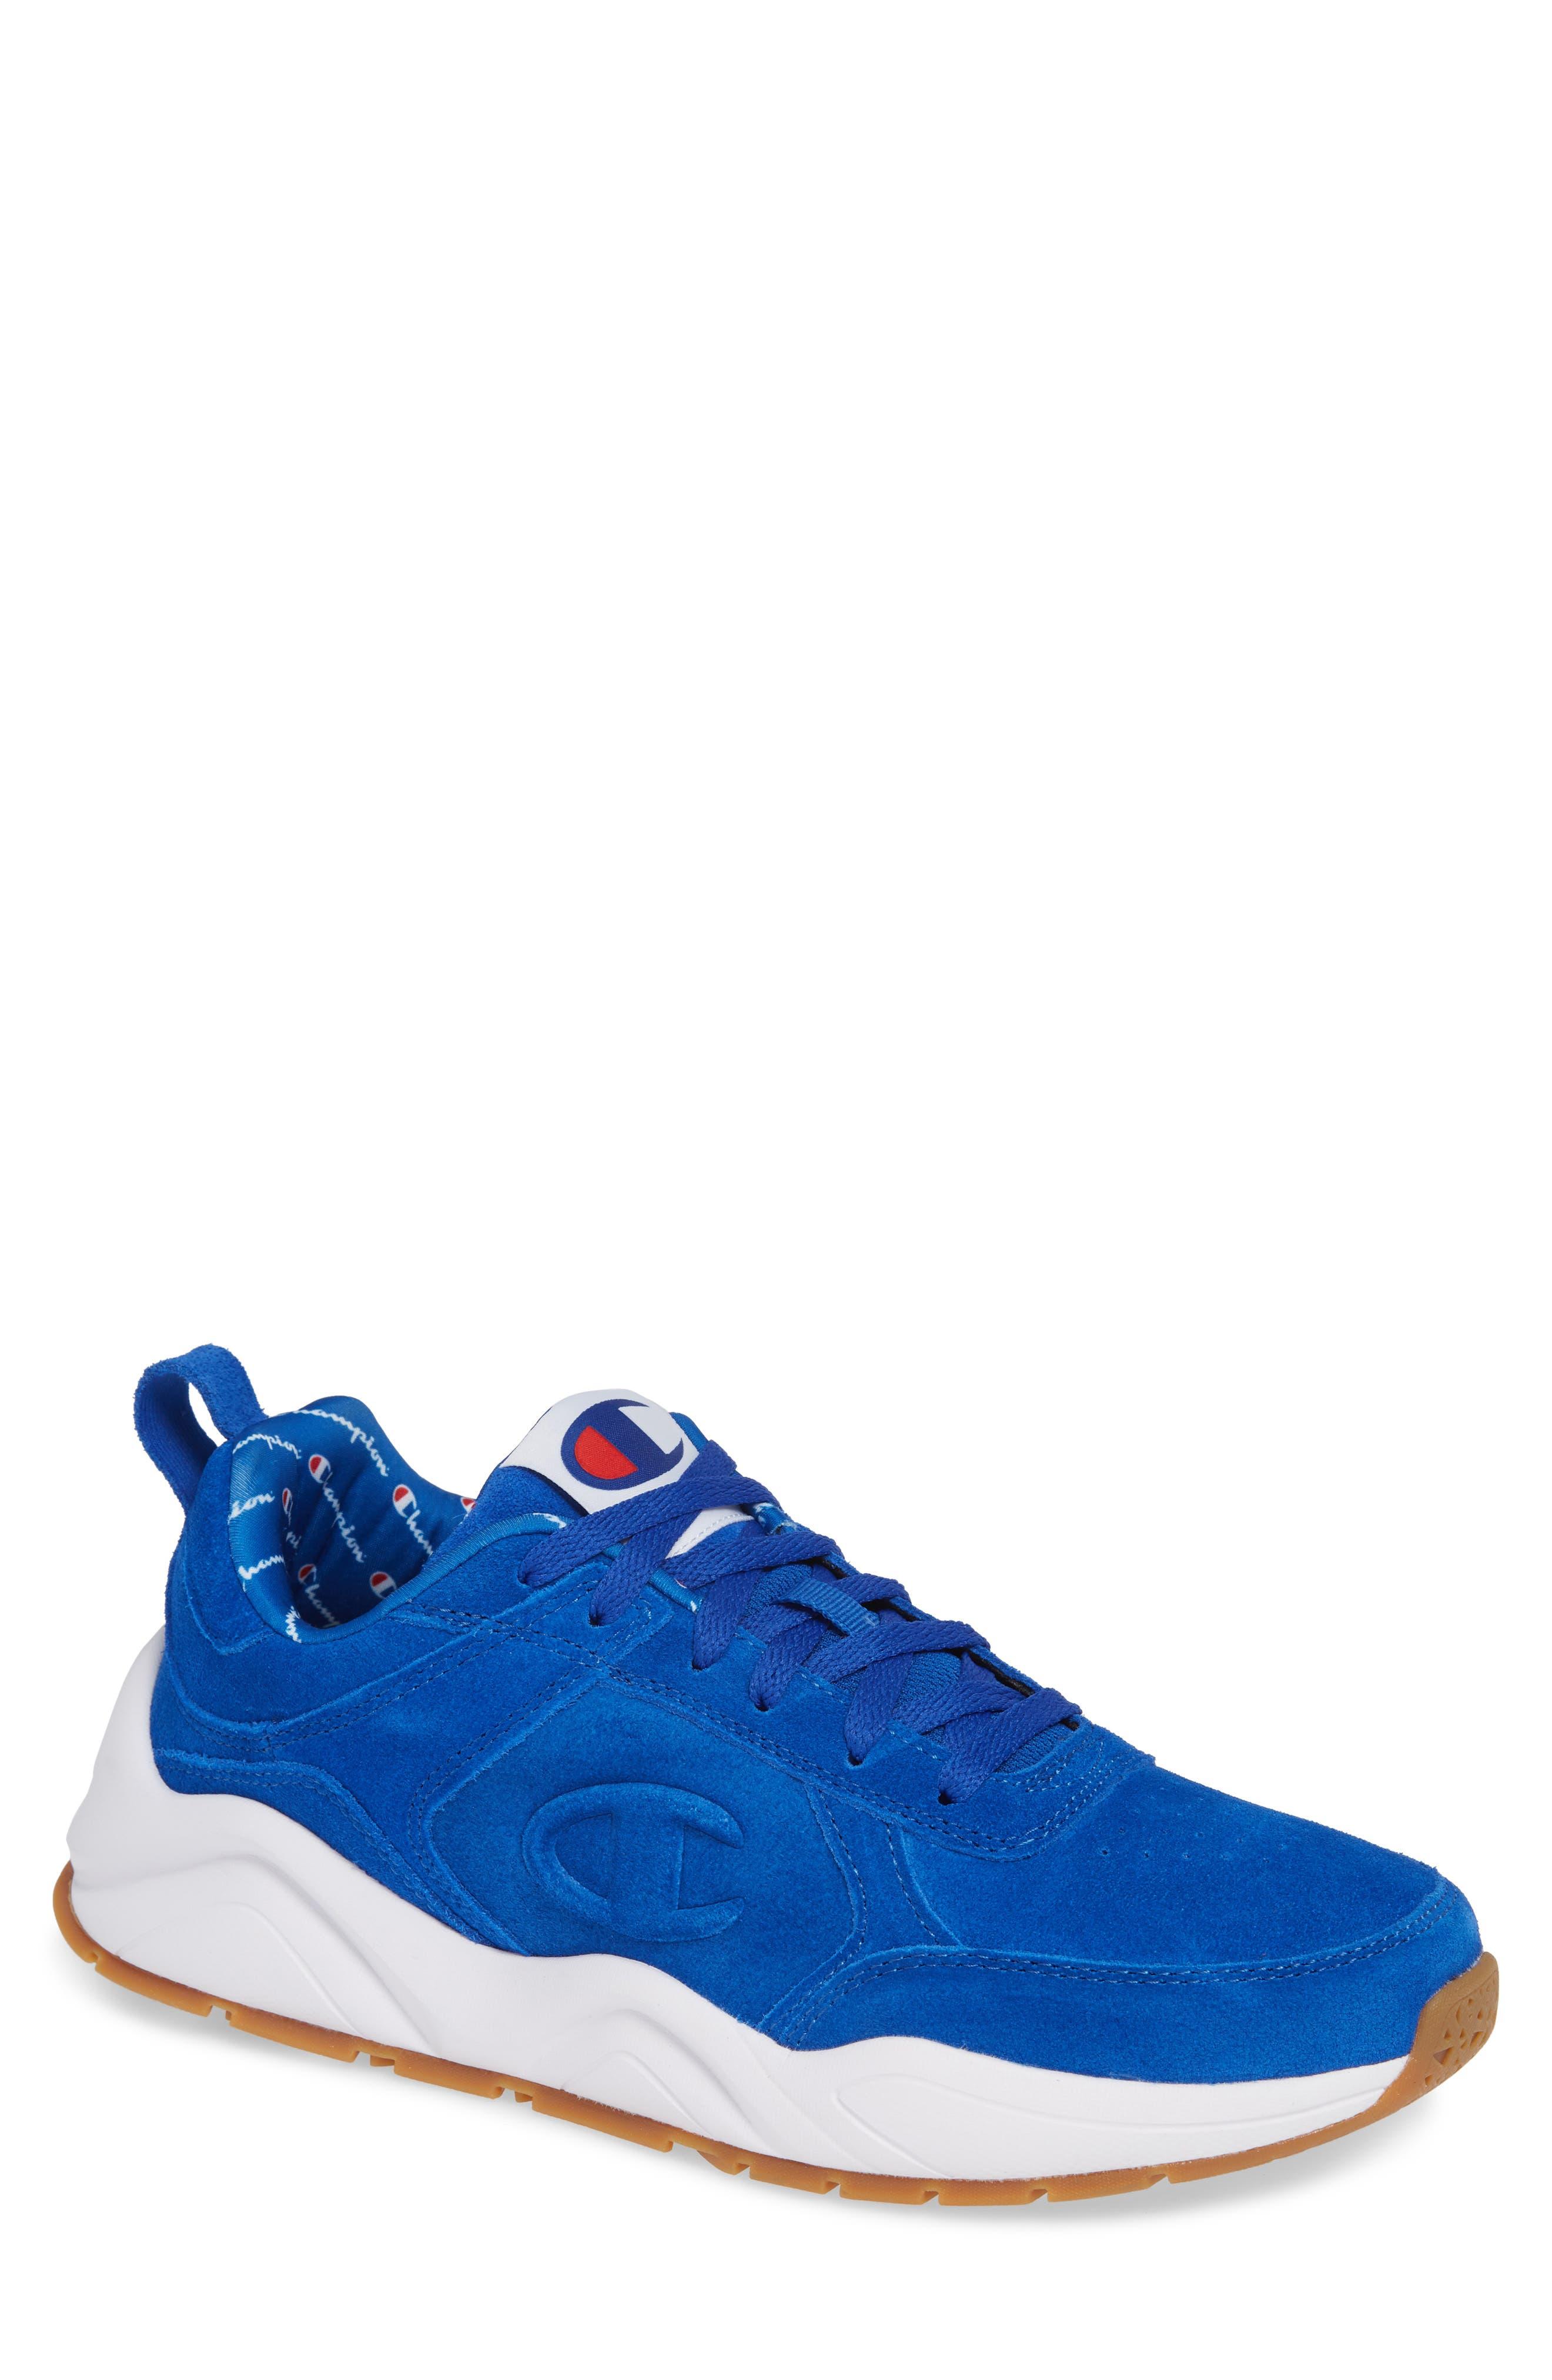 93Eighteen Sneaker,                             Main thumbnail 1, color,                             BLUE SUEDE